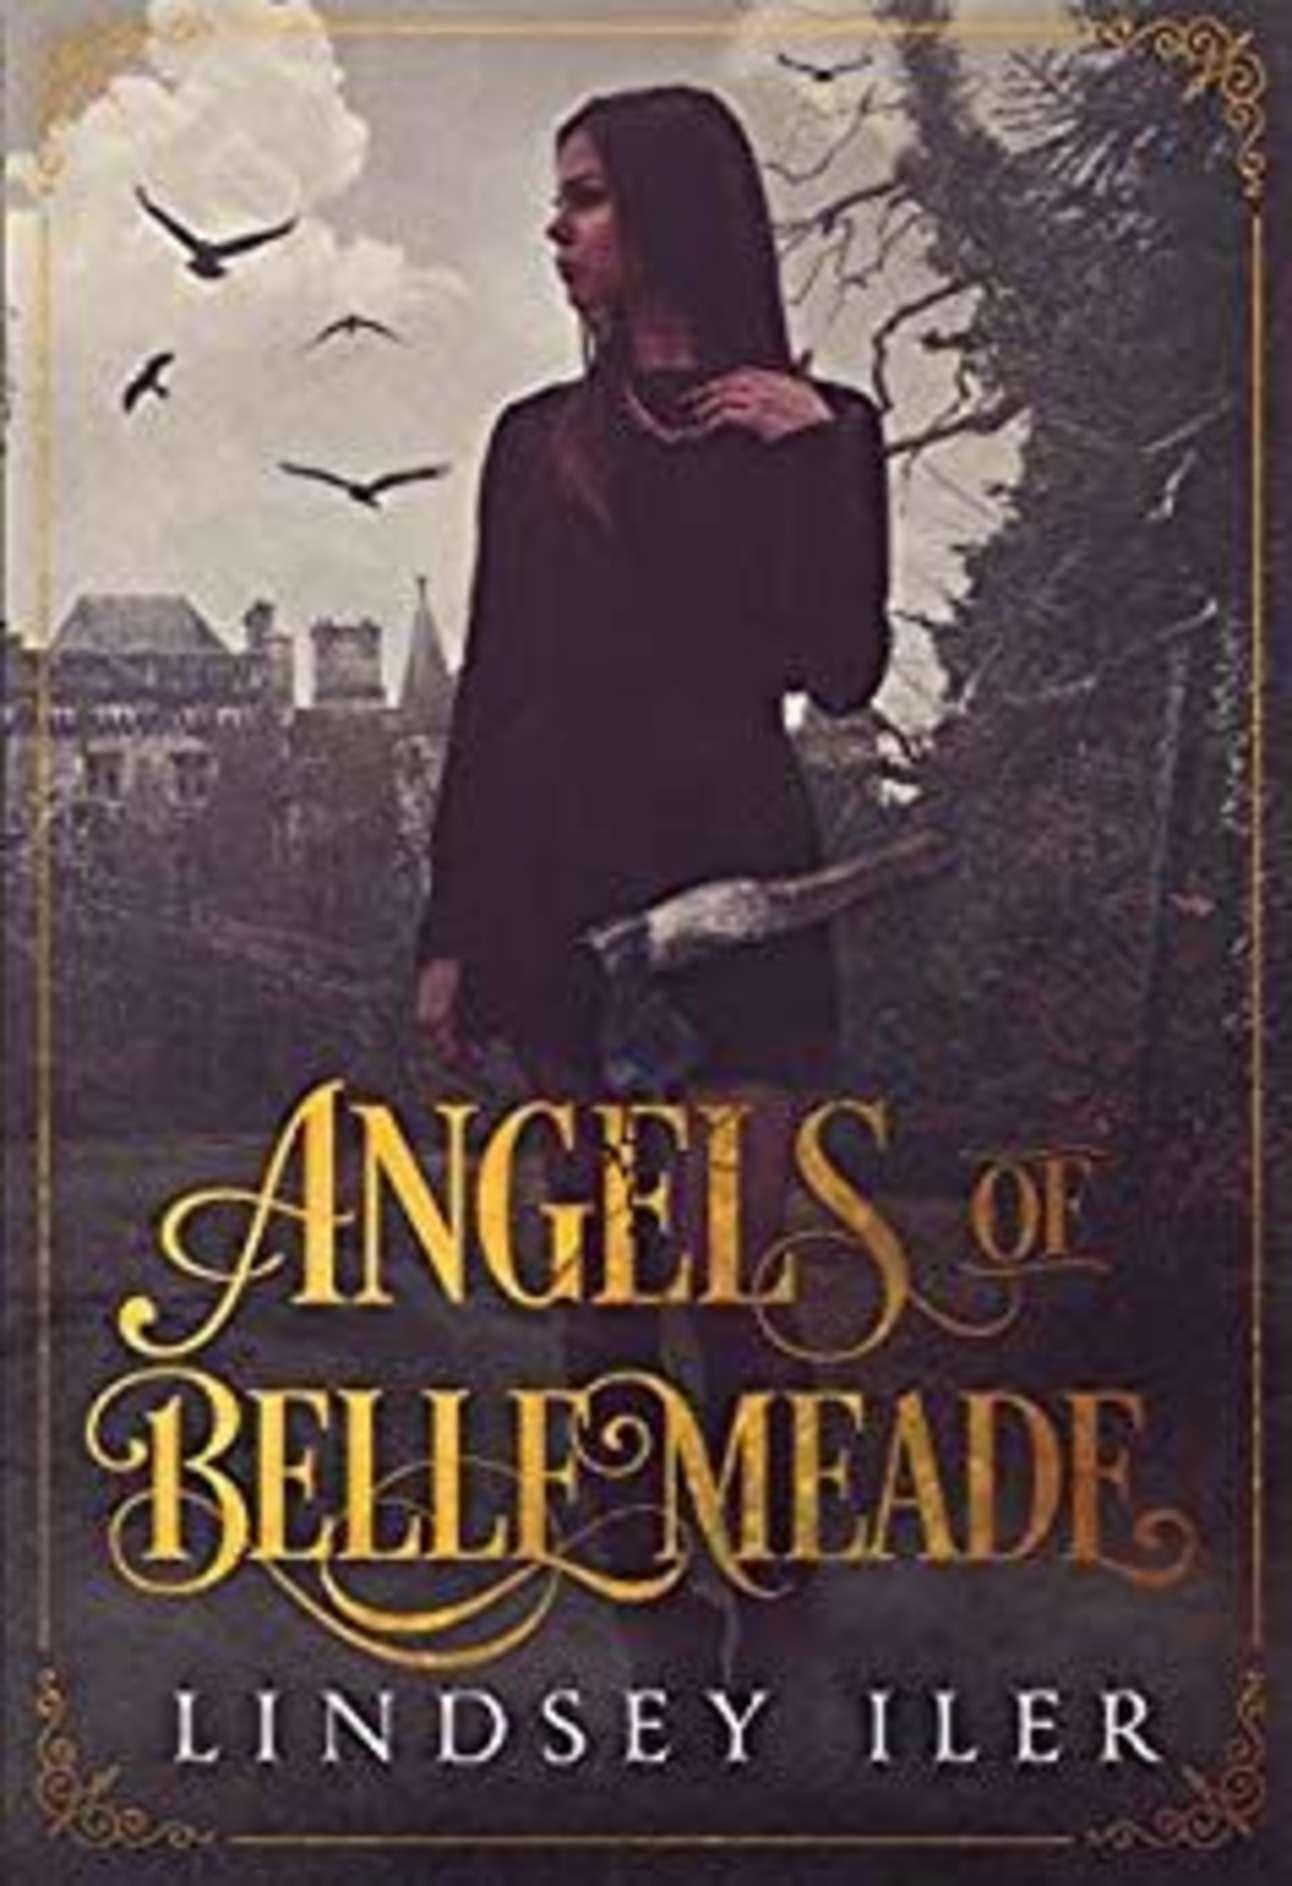 Angels of Belle Meade